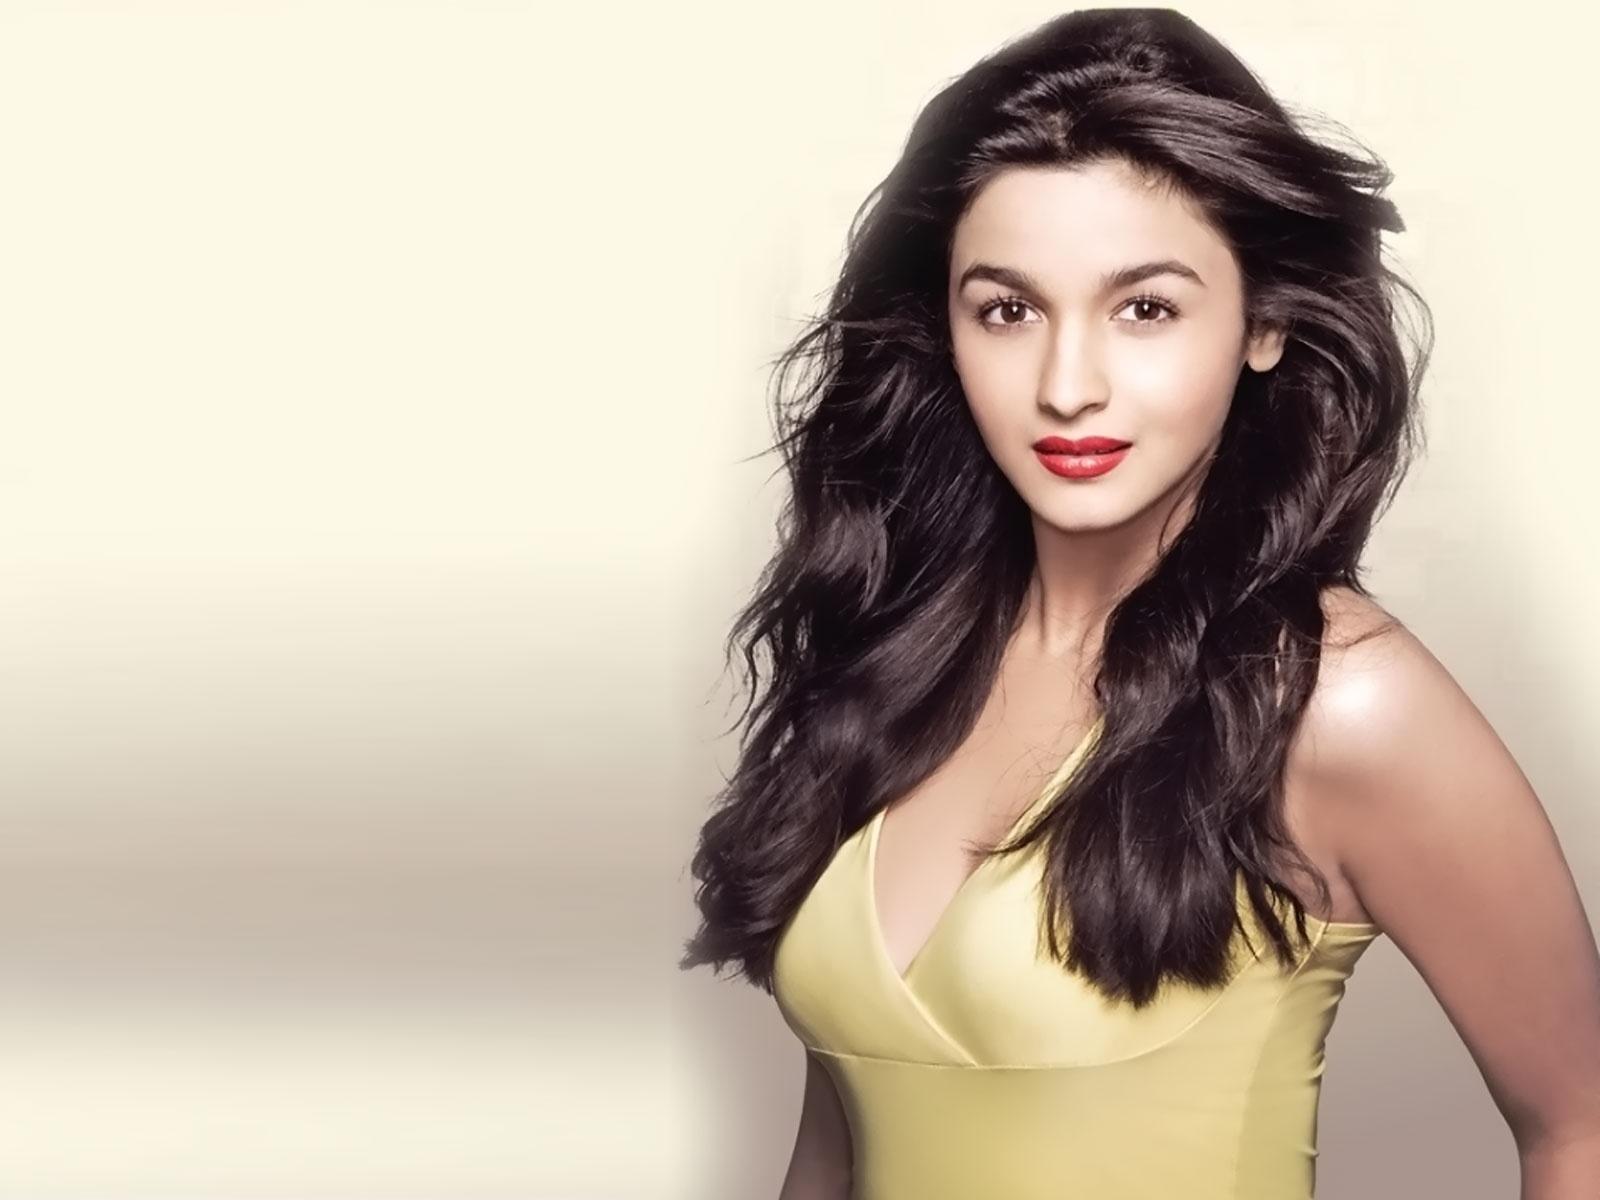 Pooja bhatt actress pic indian nude